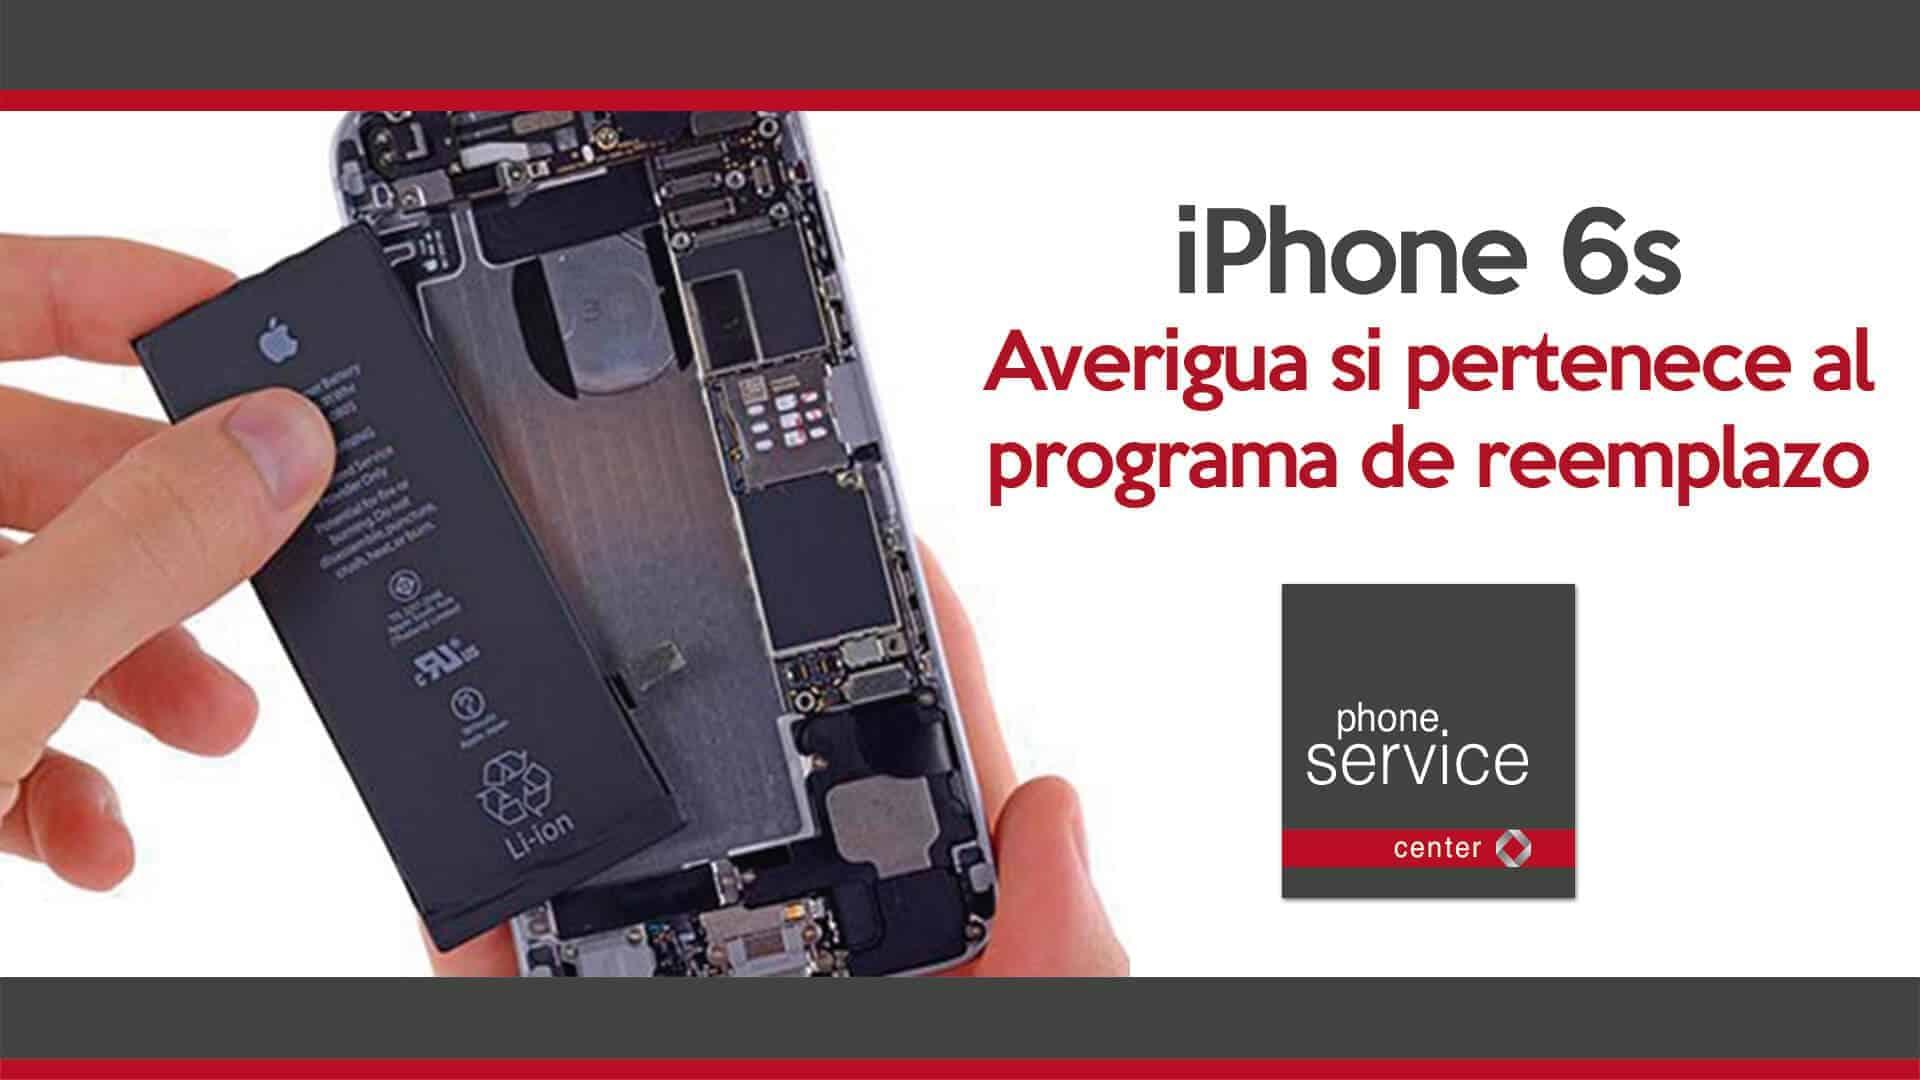 iPhone 6s como saber si pertenece al programa de reemplazo de bateria de Apple